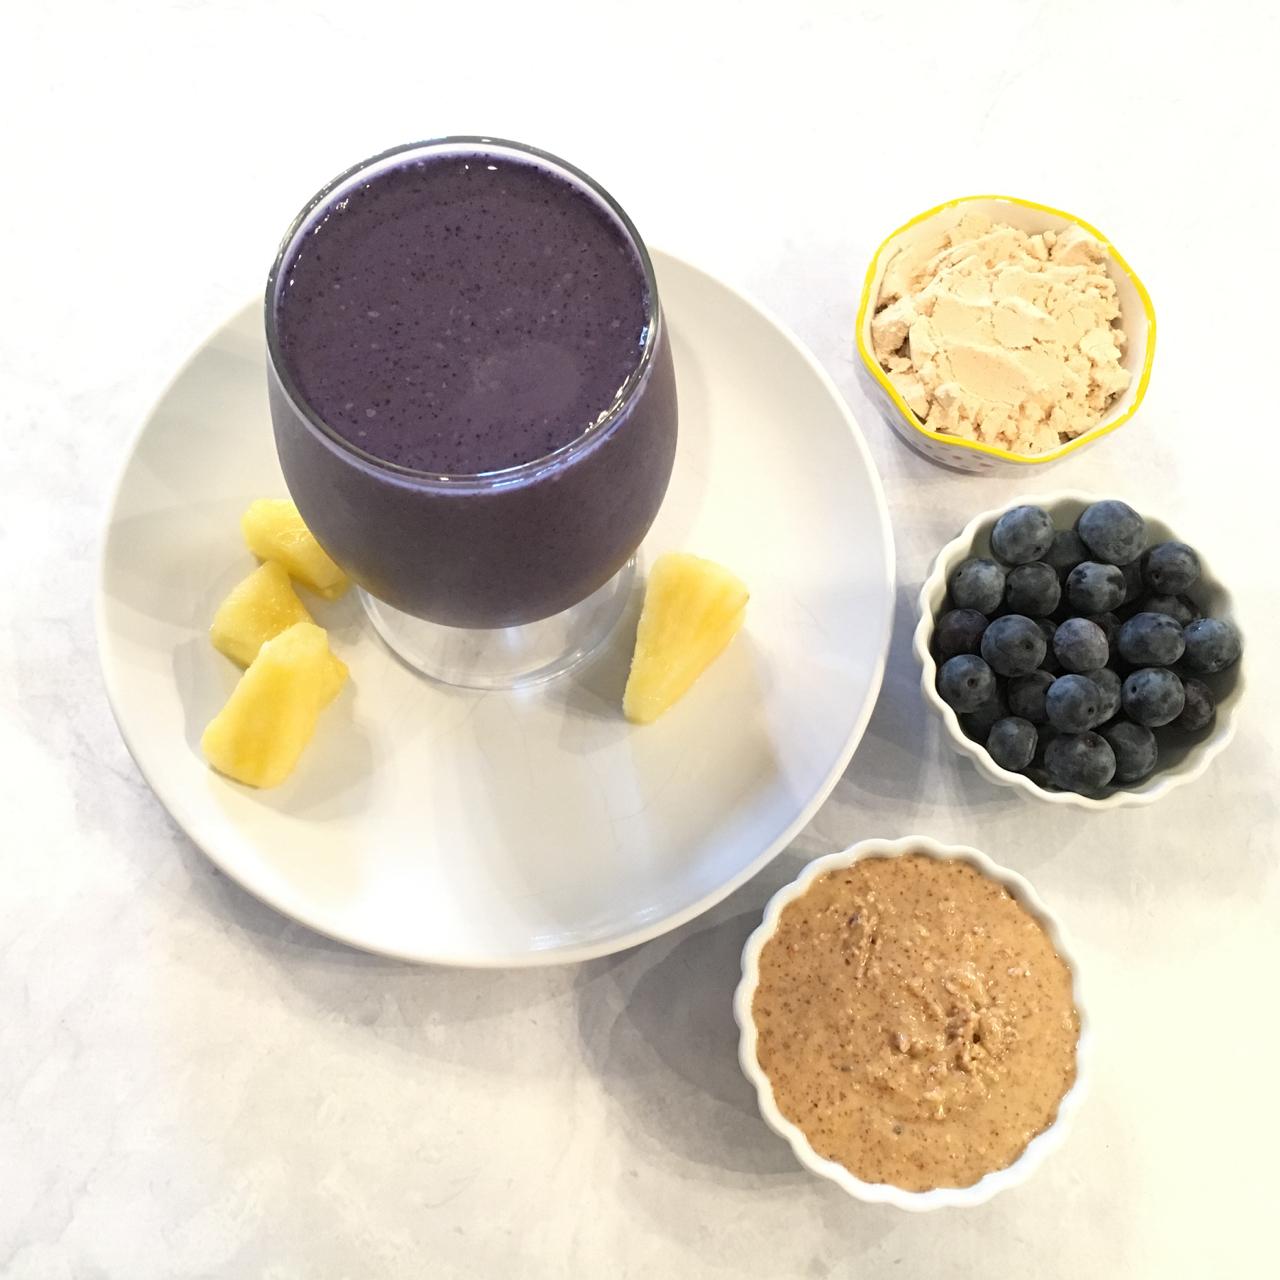 Blueberry Pineapple Protein Smoothie